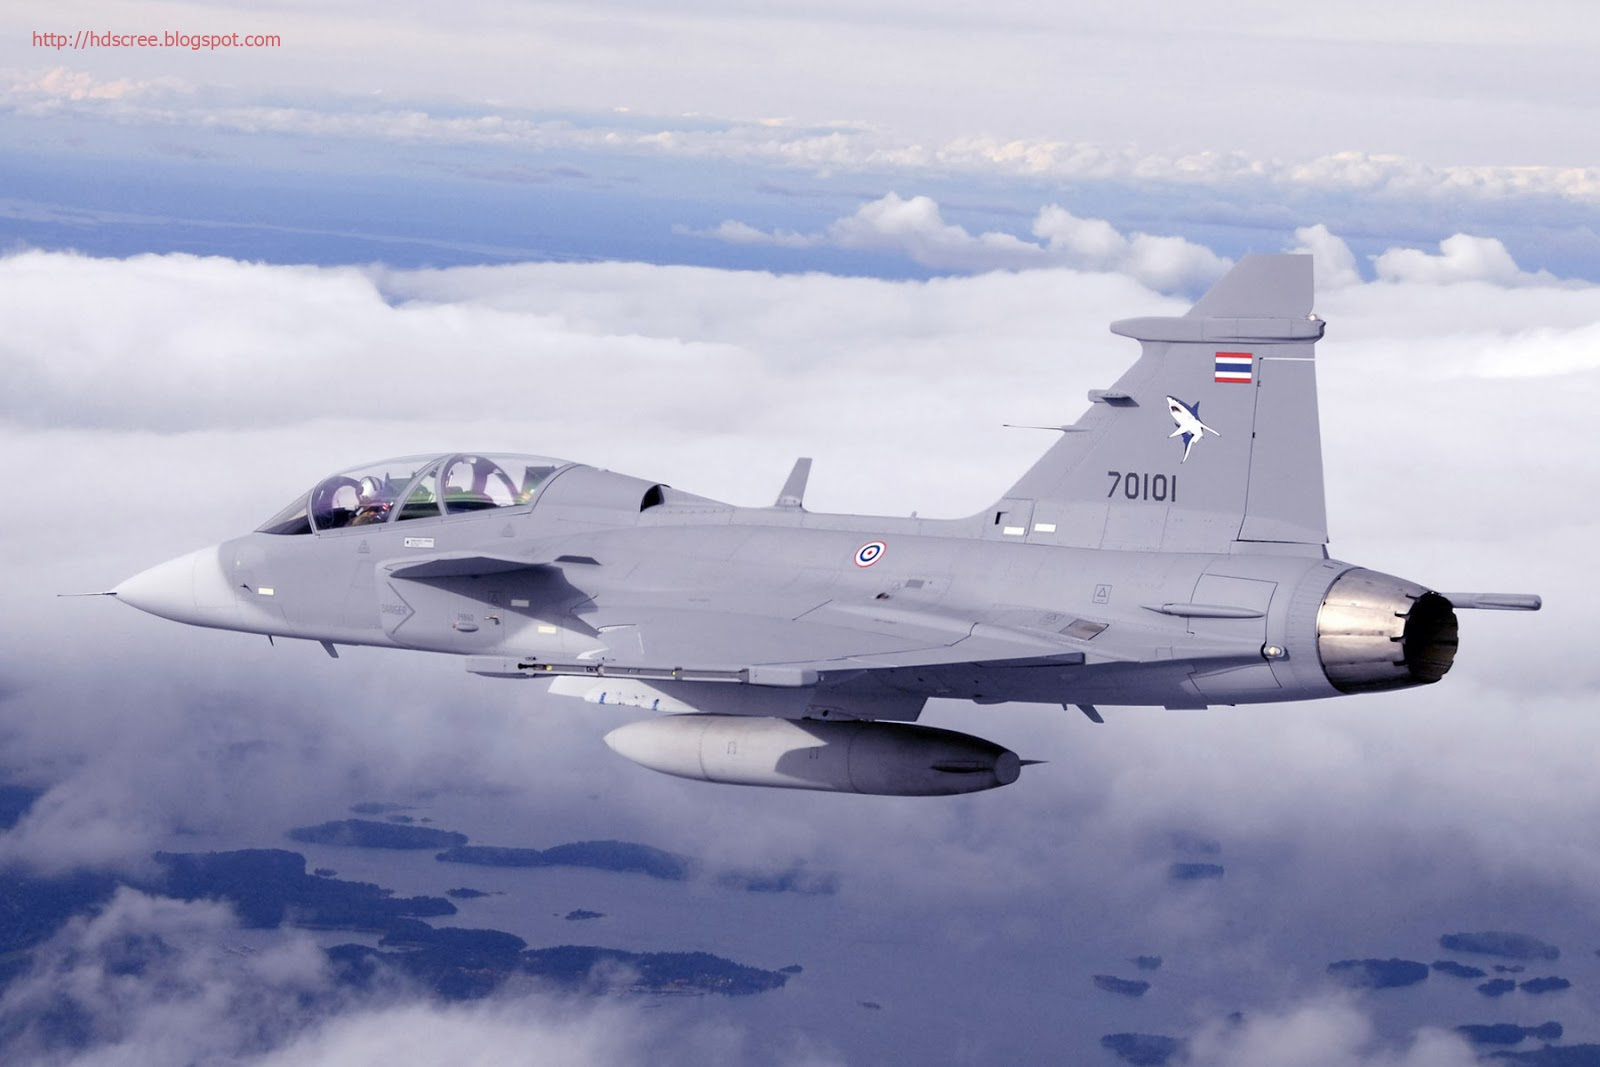 military aircraft hd background   hd wallpaper   hd screensaver   hd